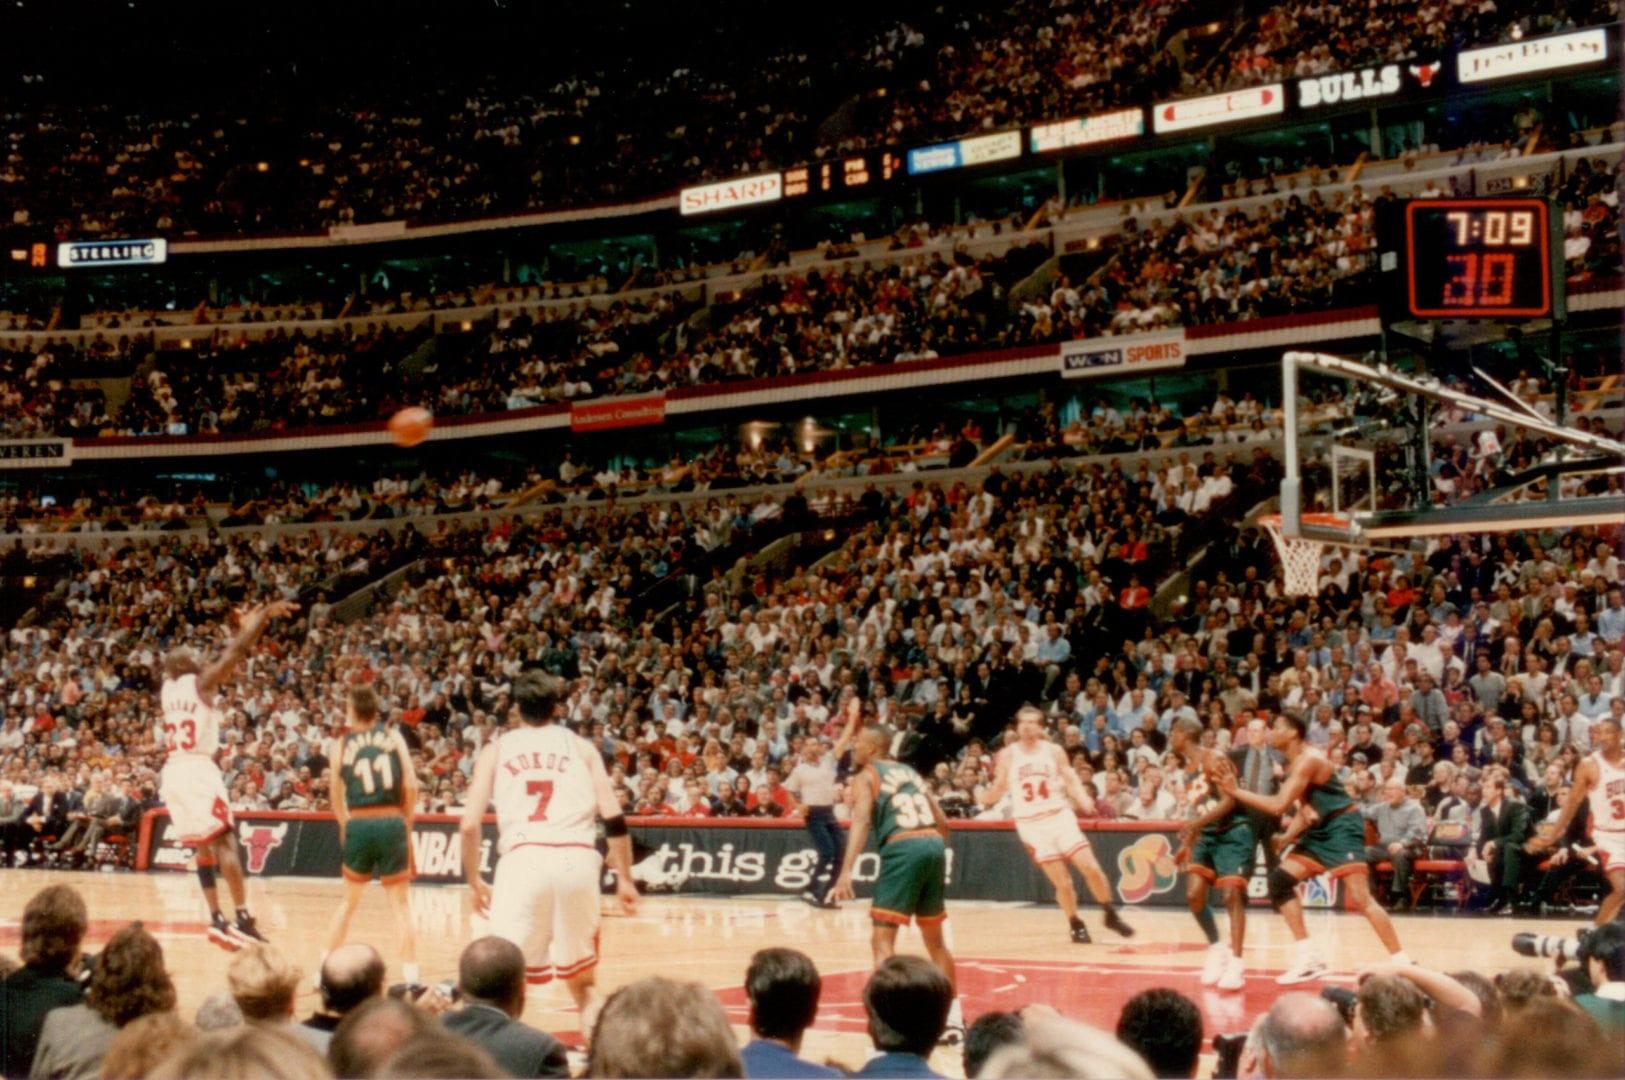 An image of Michael Jordan's jumpshot